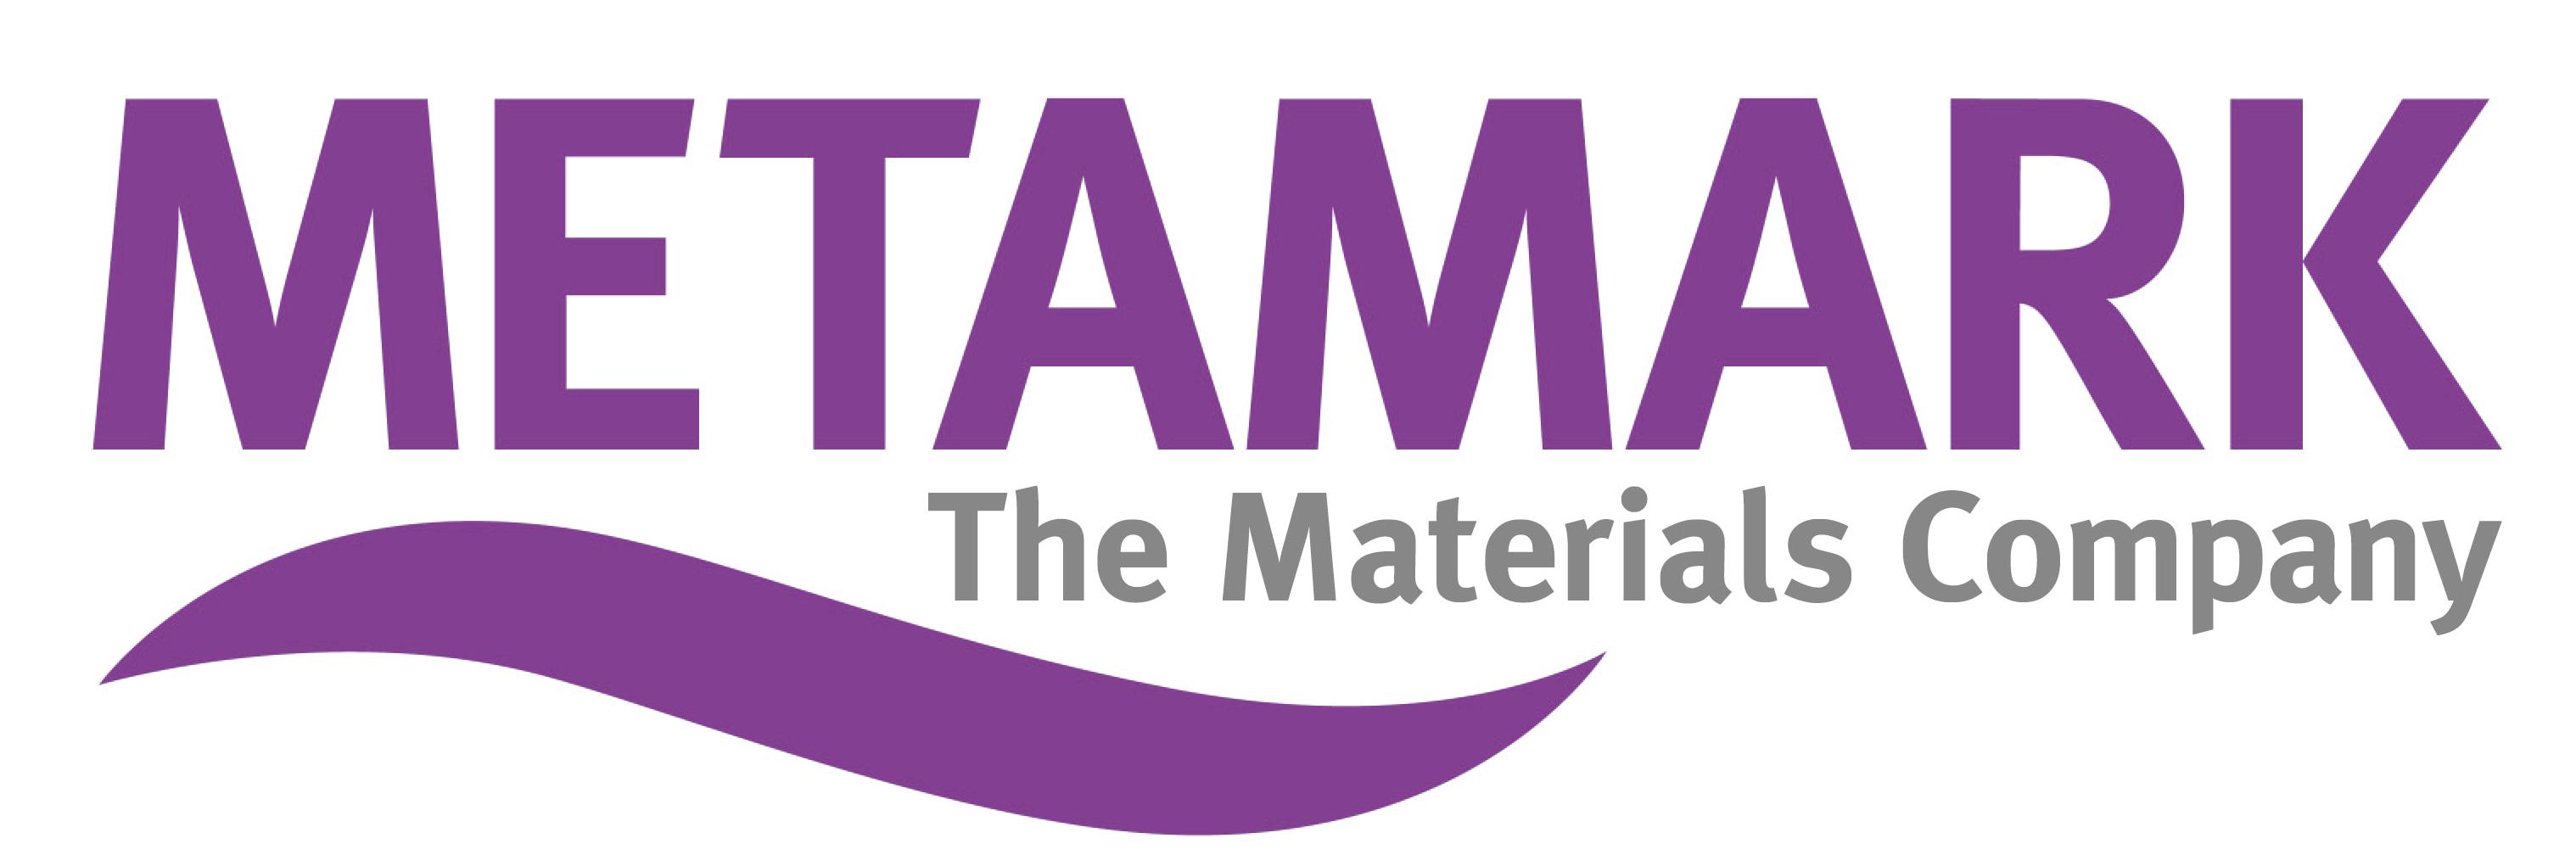 Metamark-Logo-new